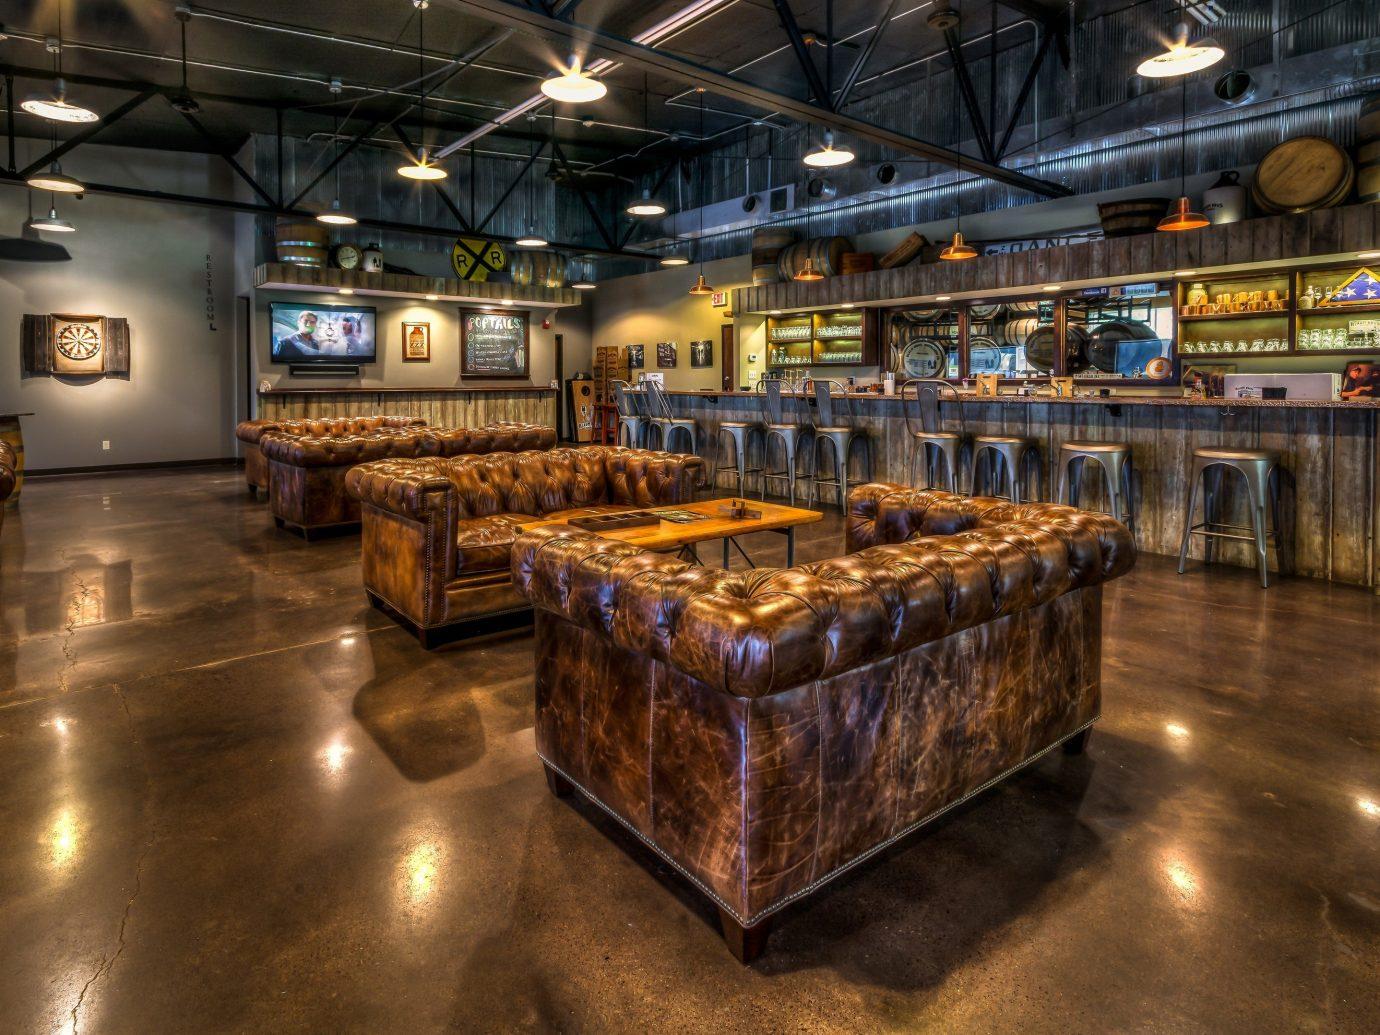 Trip Ideas indoor floor ceiling building Lobby interior design factory retail tourist attraction stall